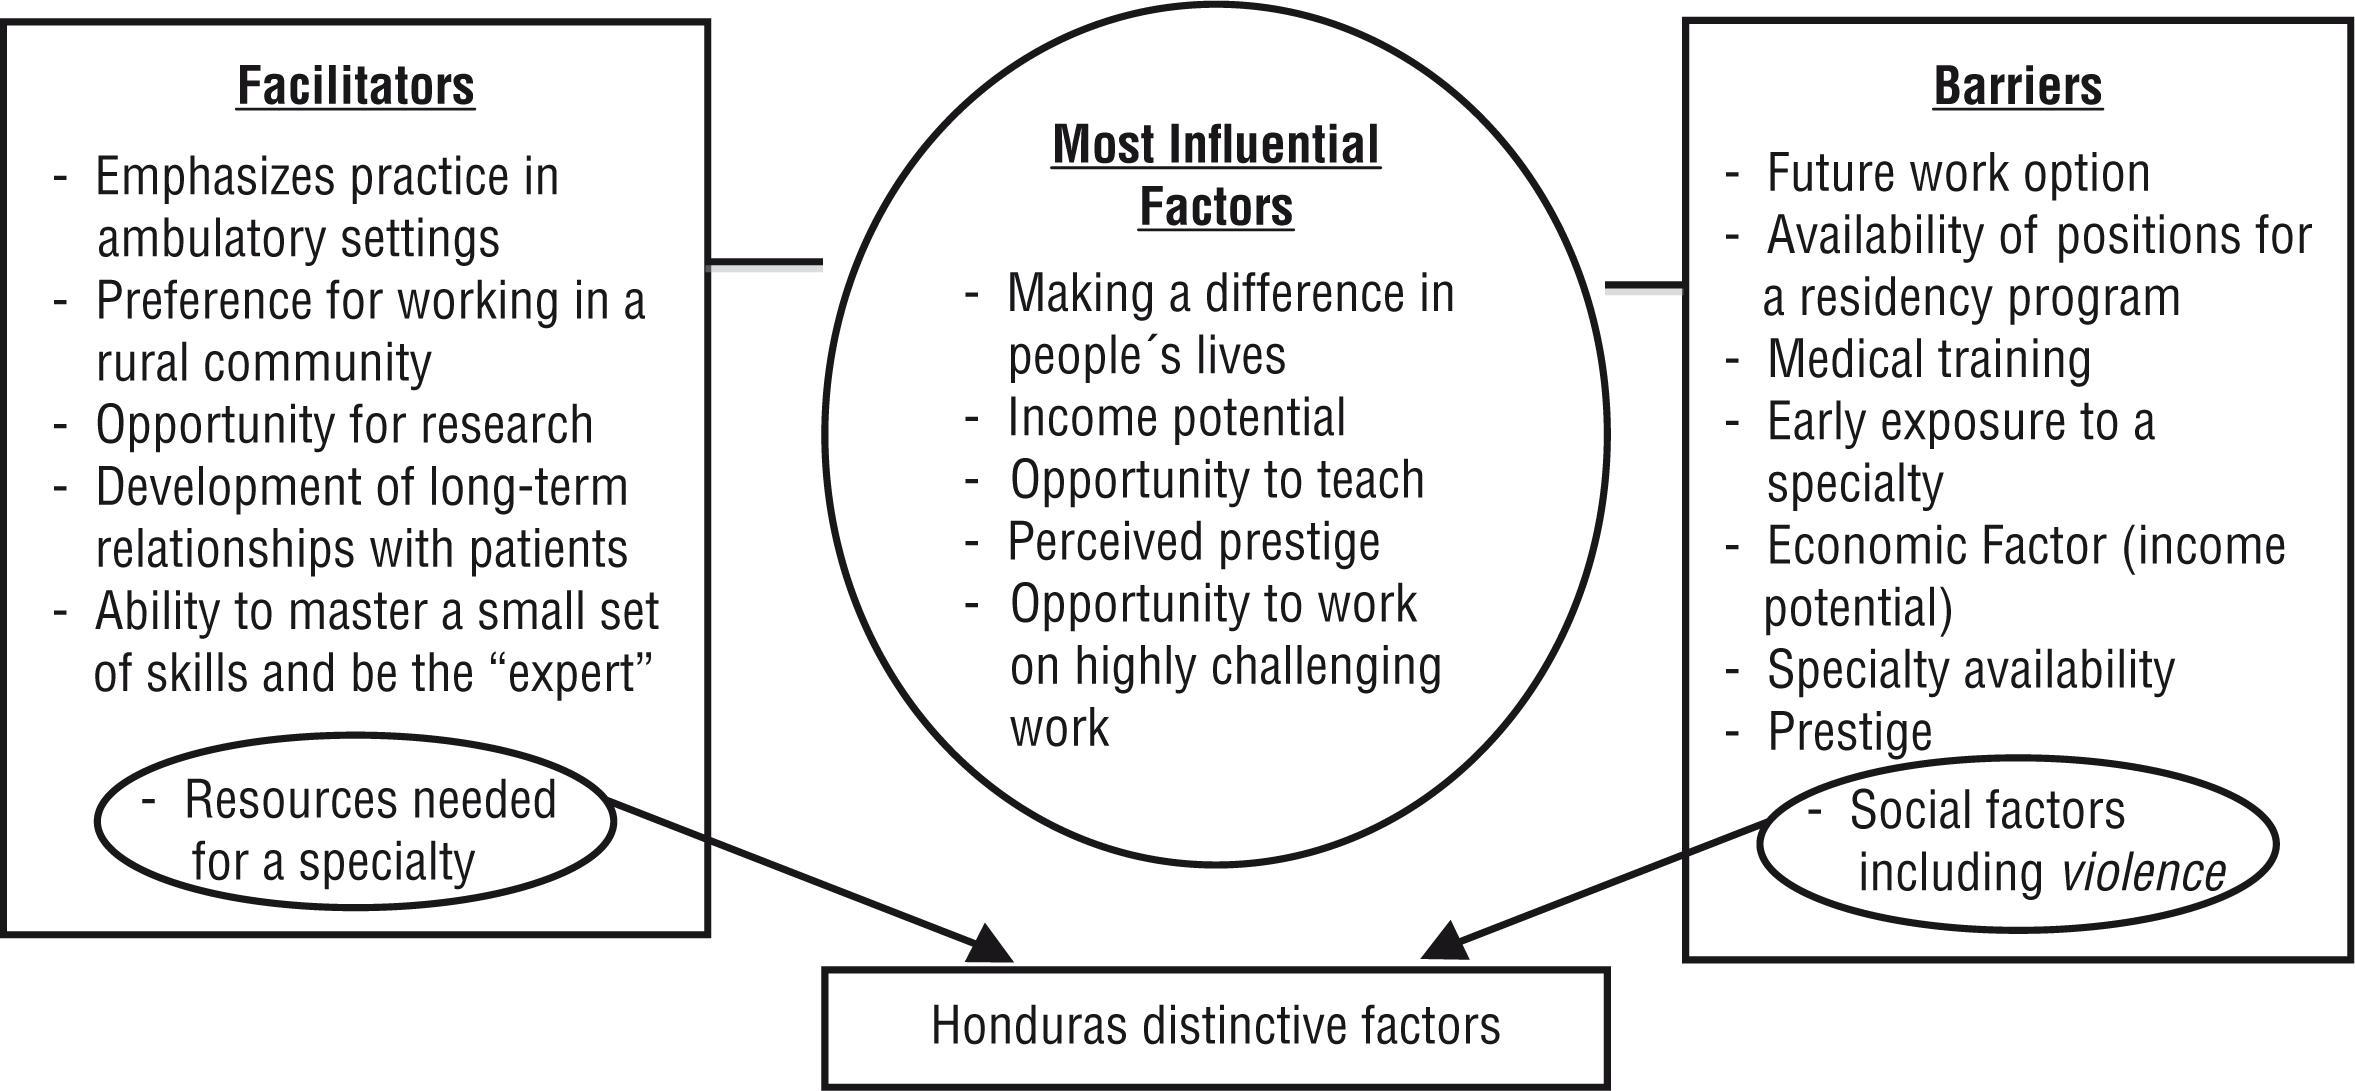 Saúde Pública - Factors that influence career choice in primary ...